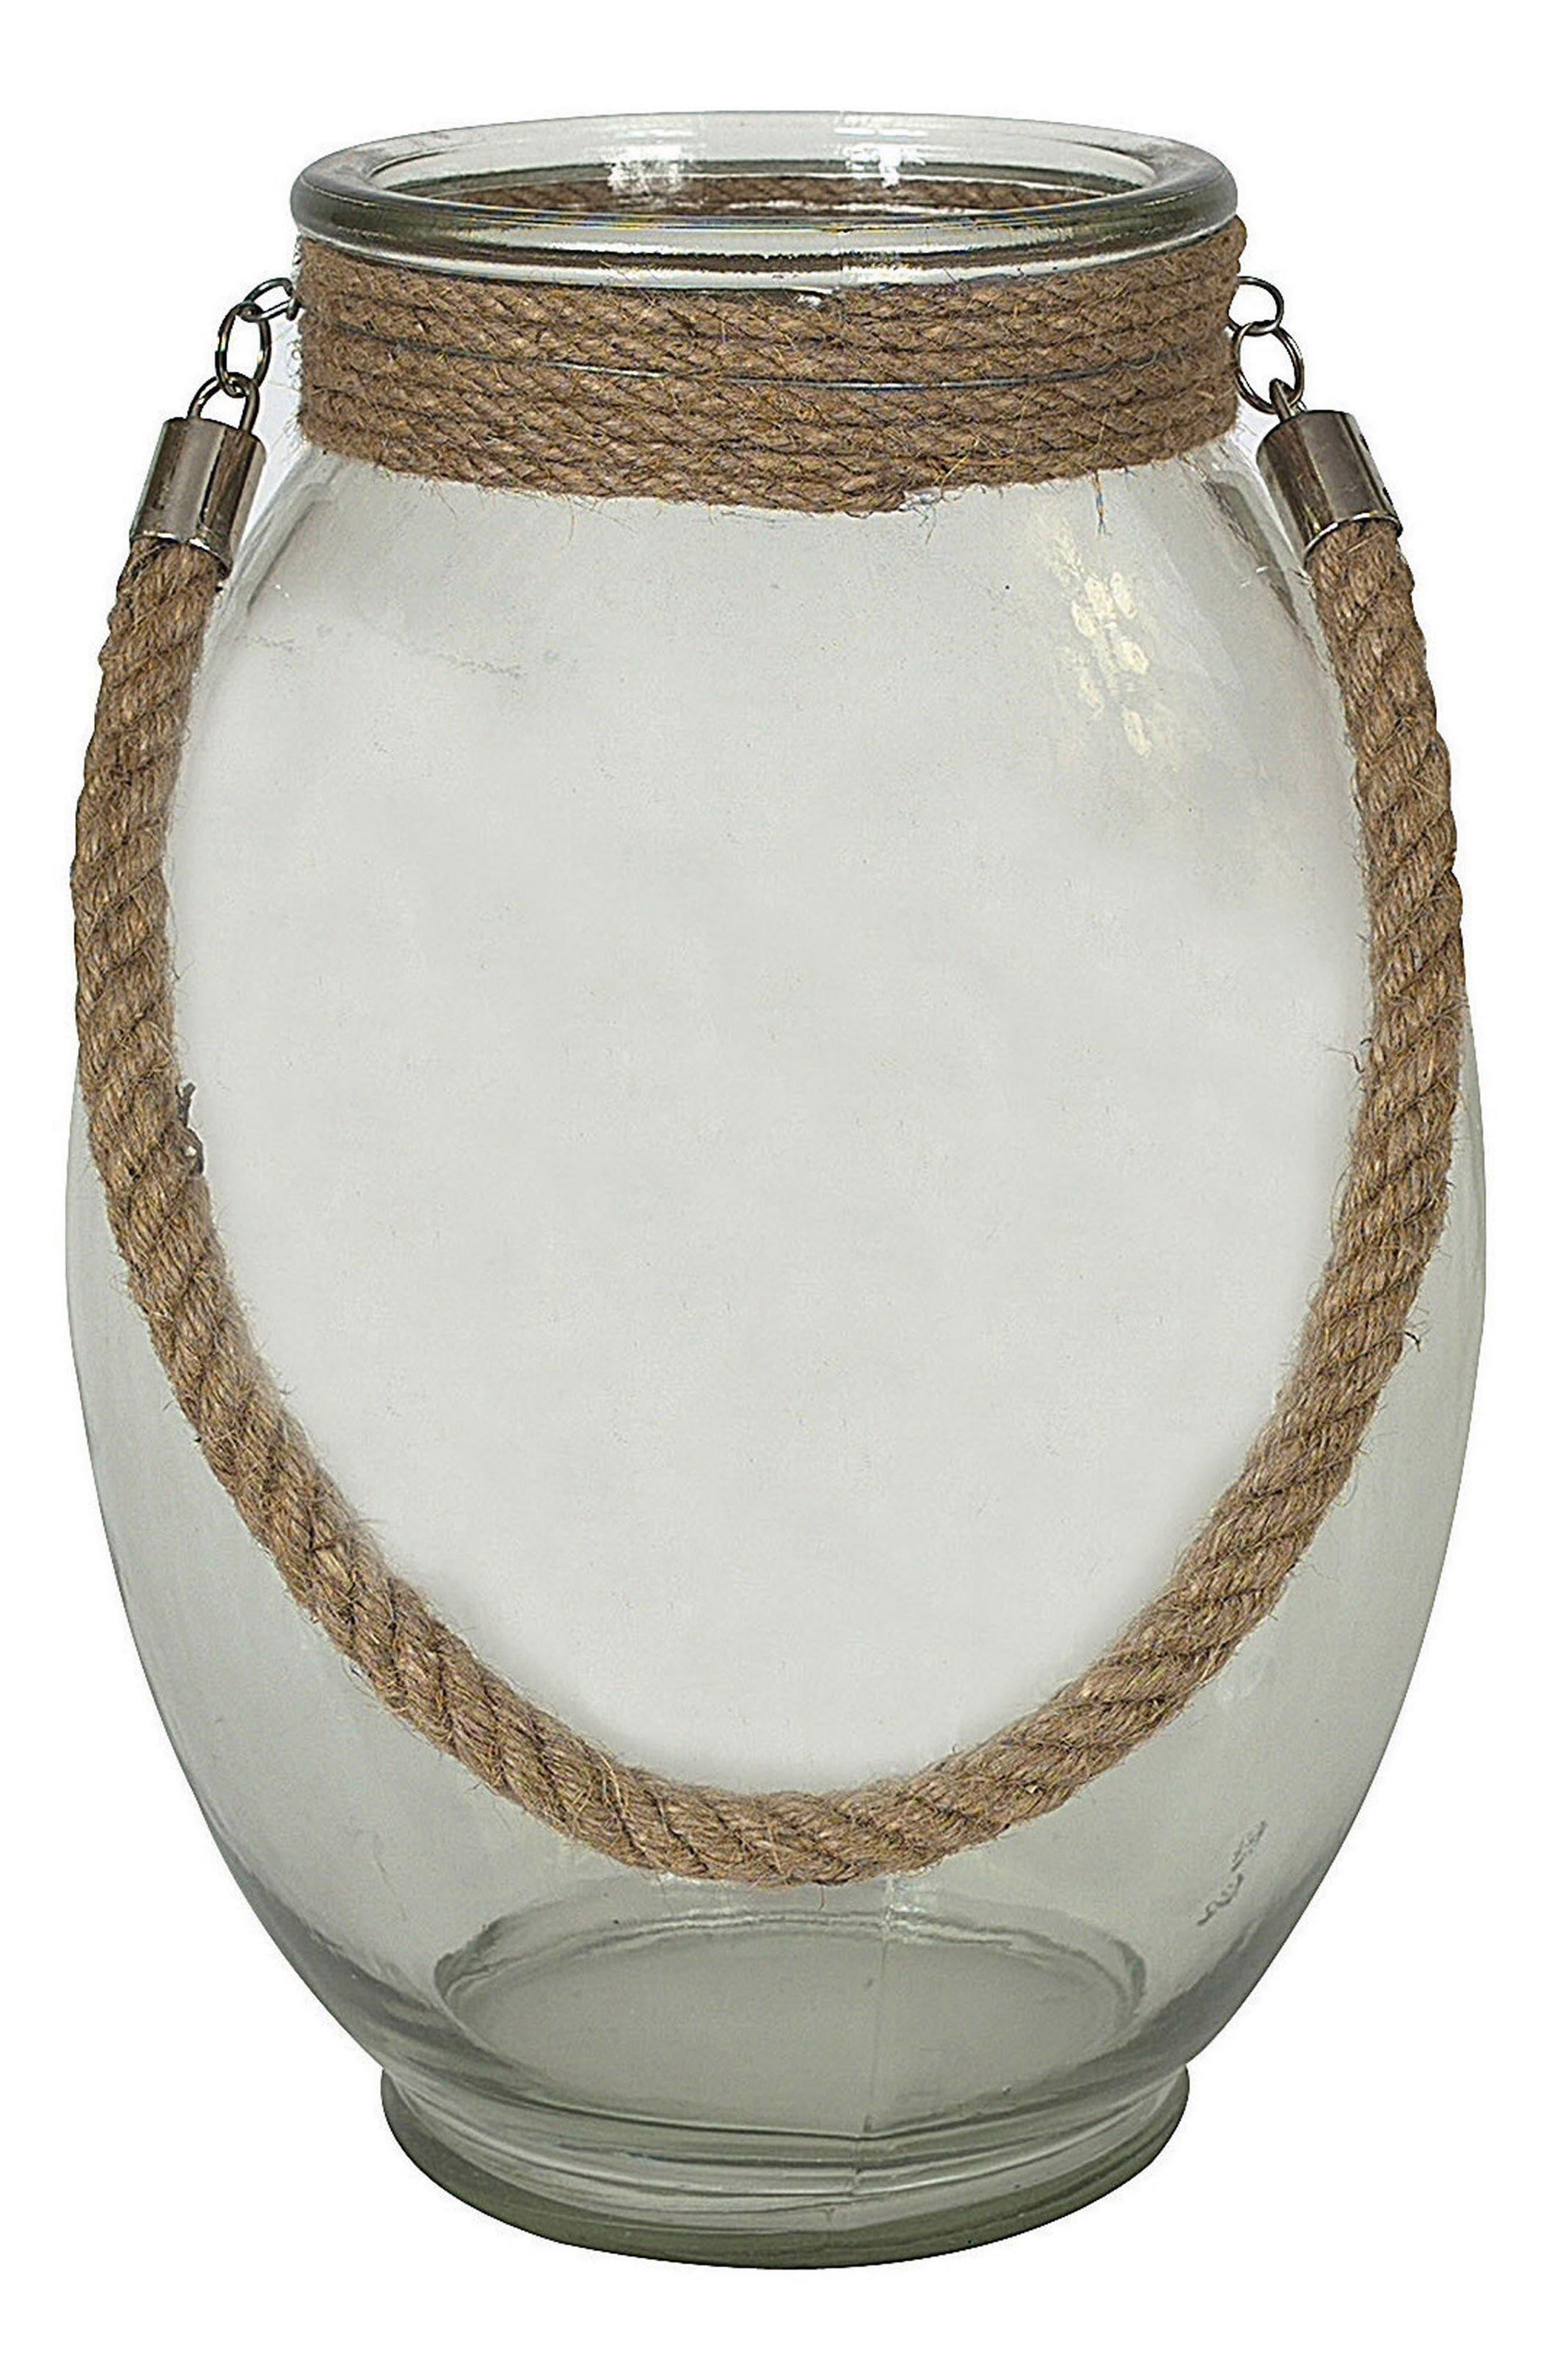 Main Image - Creative Co-Op Glass Vase